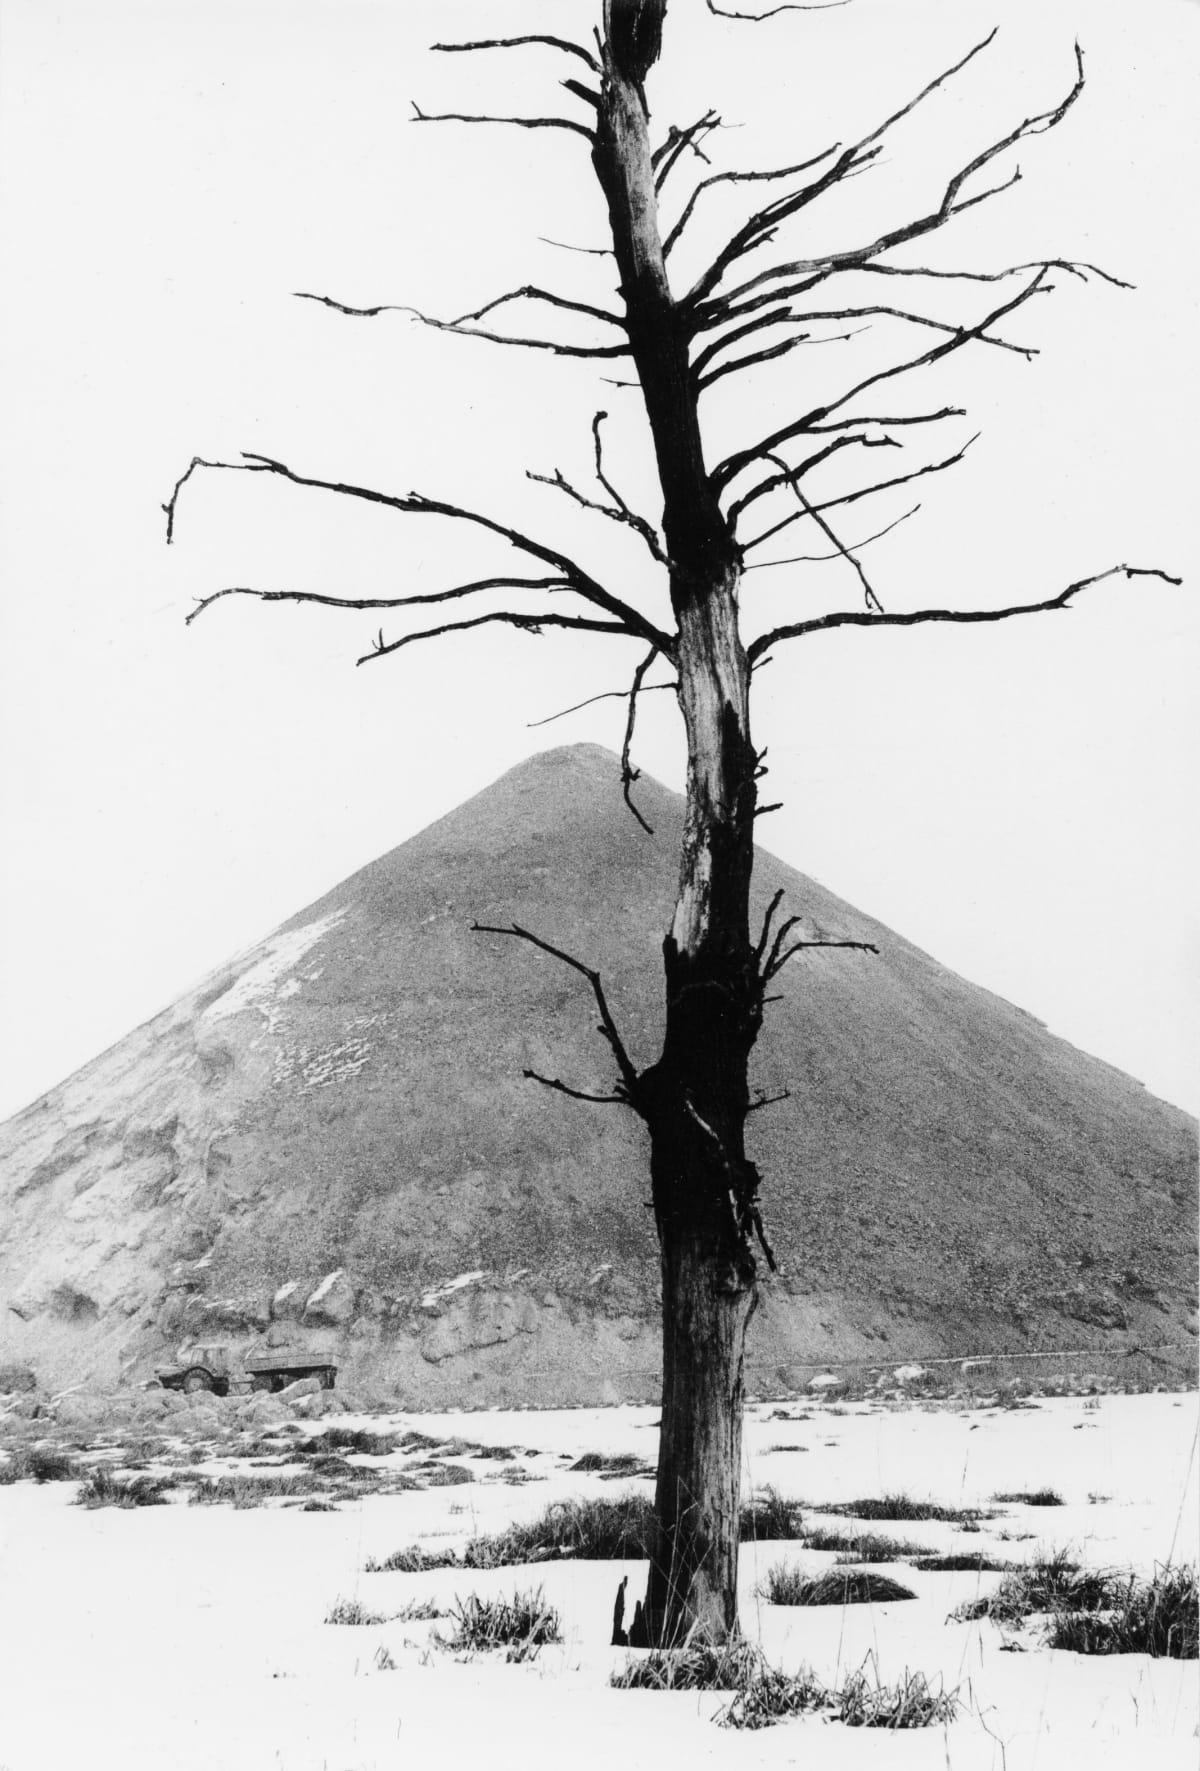 Michal Cala, ' A dead tree and the slagheap/ 'Martwe drzewo i halda', Brzeszcze, 1978